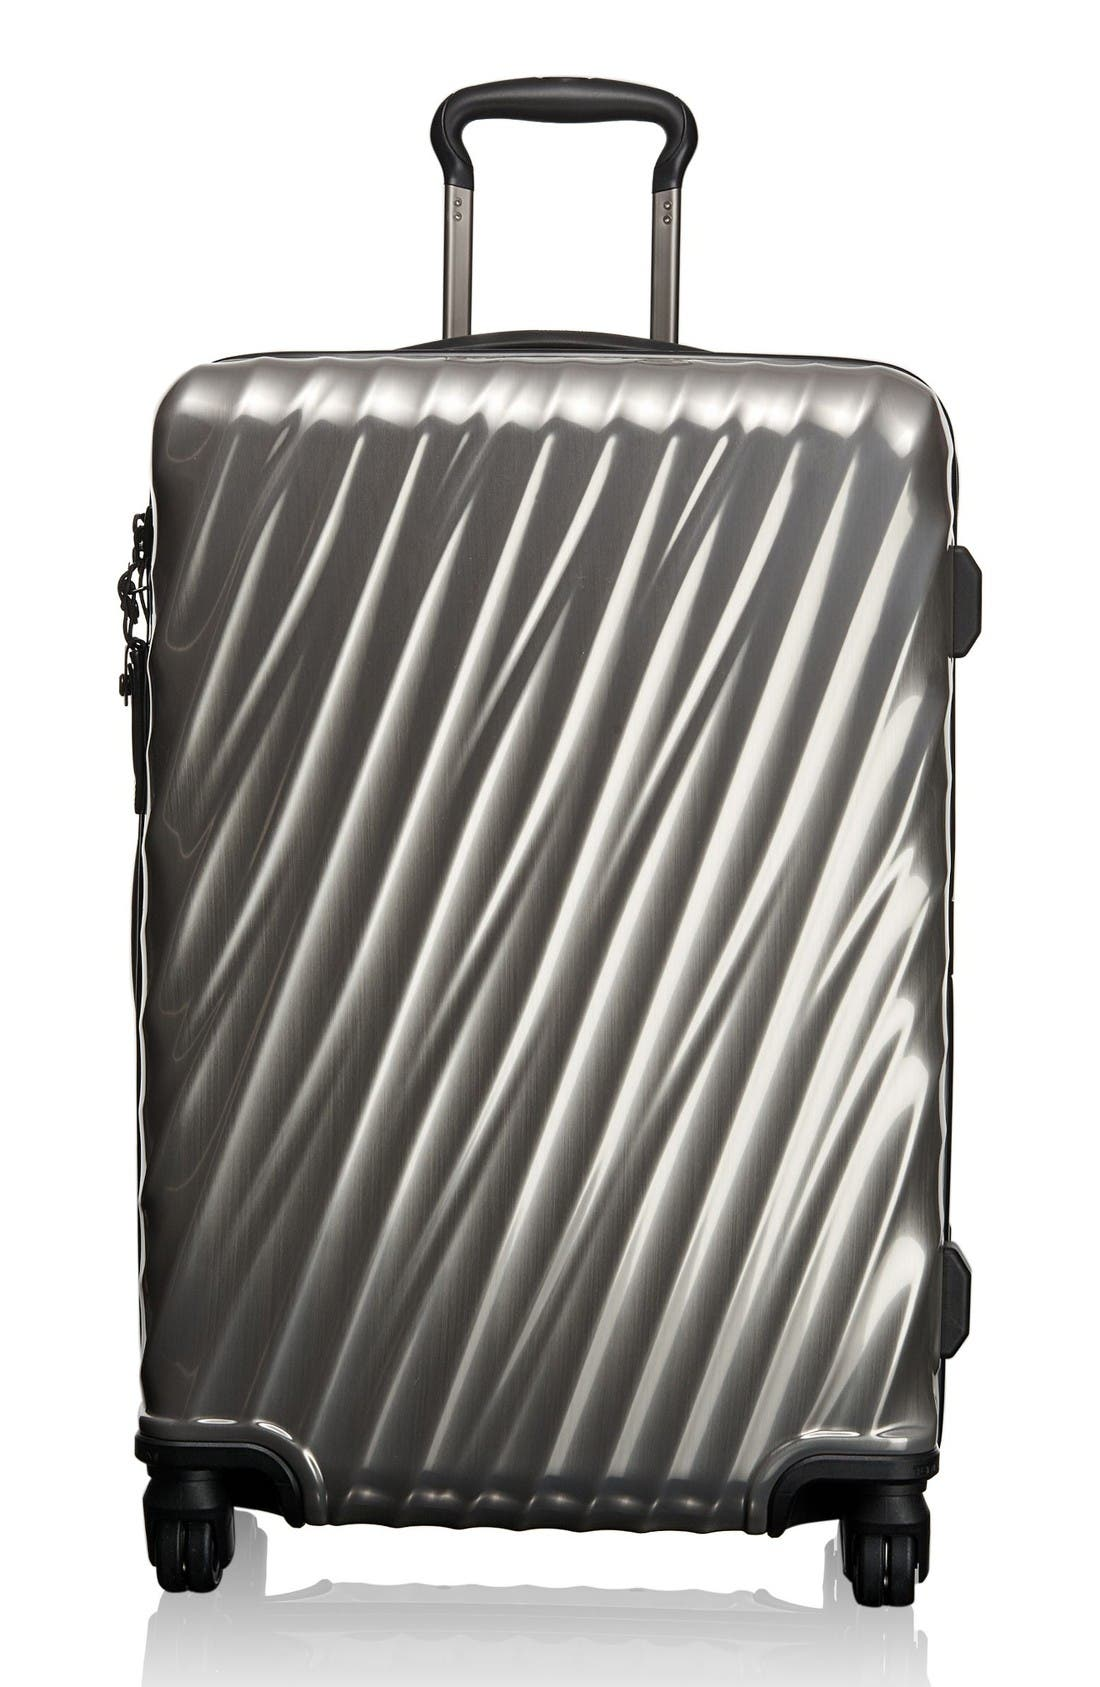 Tumi 19 Degree 26 Inch Short Trip Wheeled Packing Case